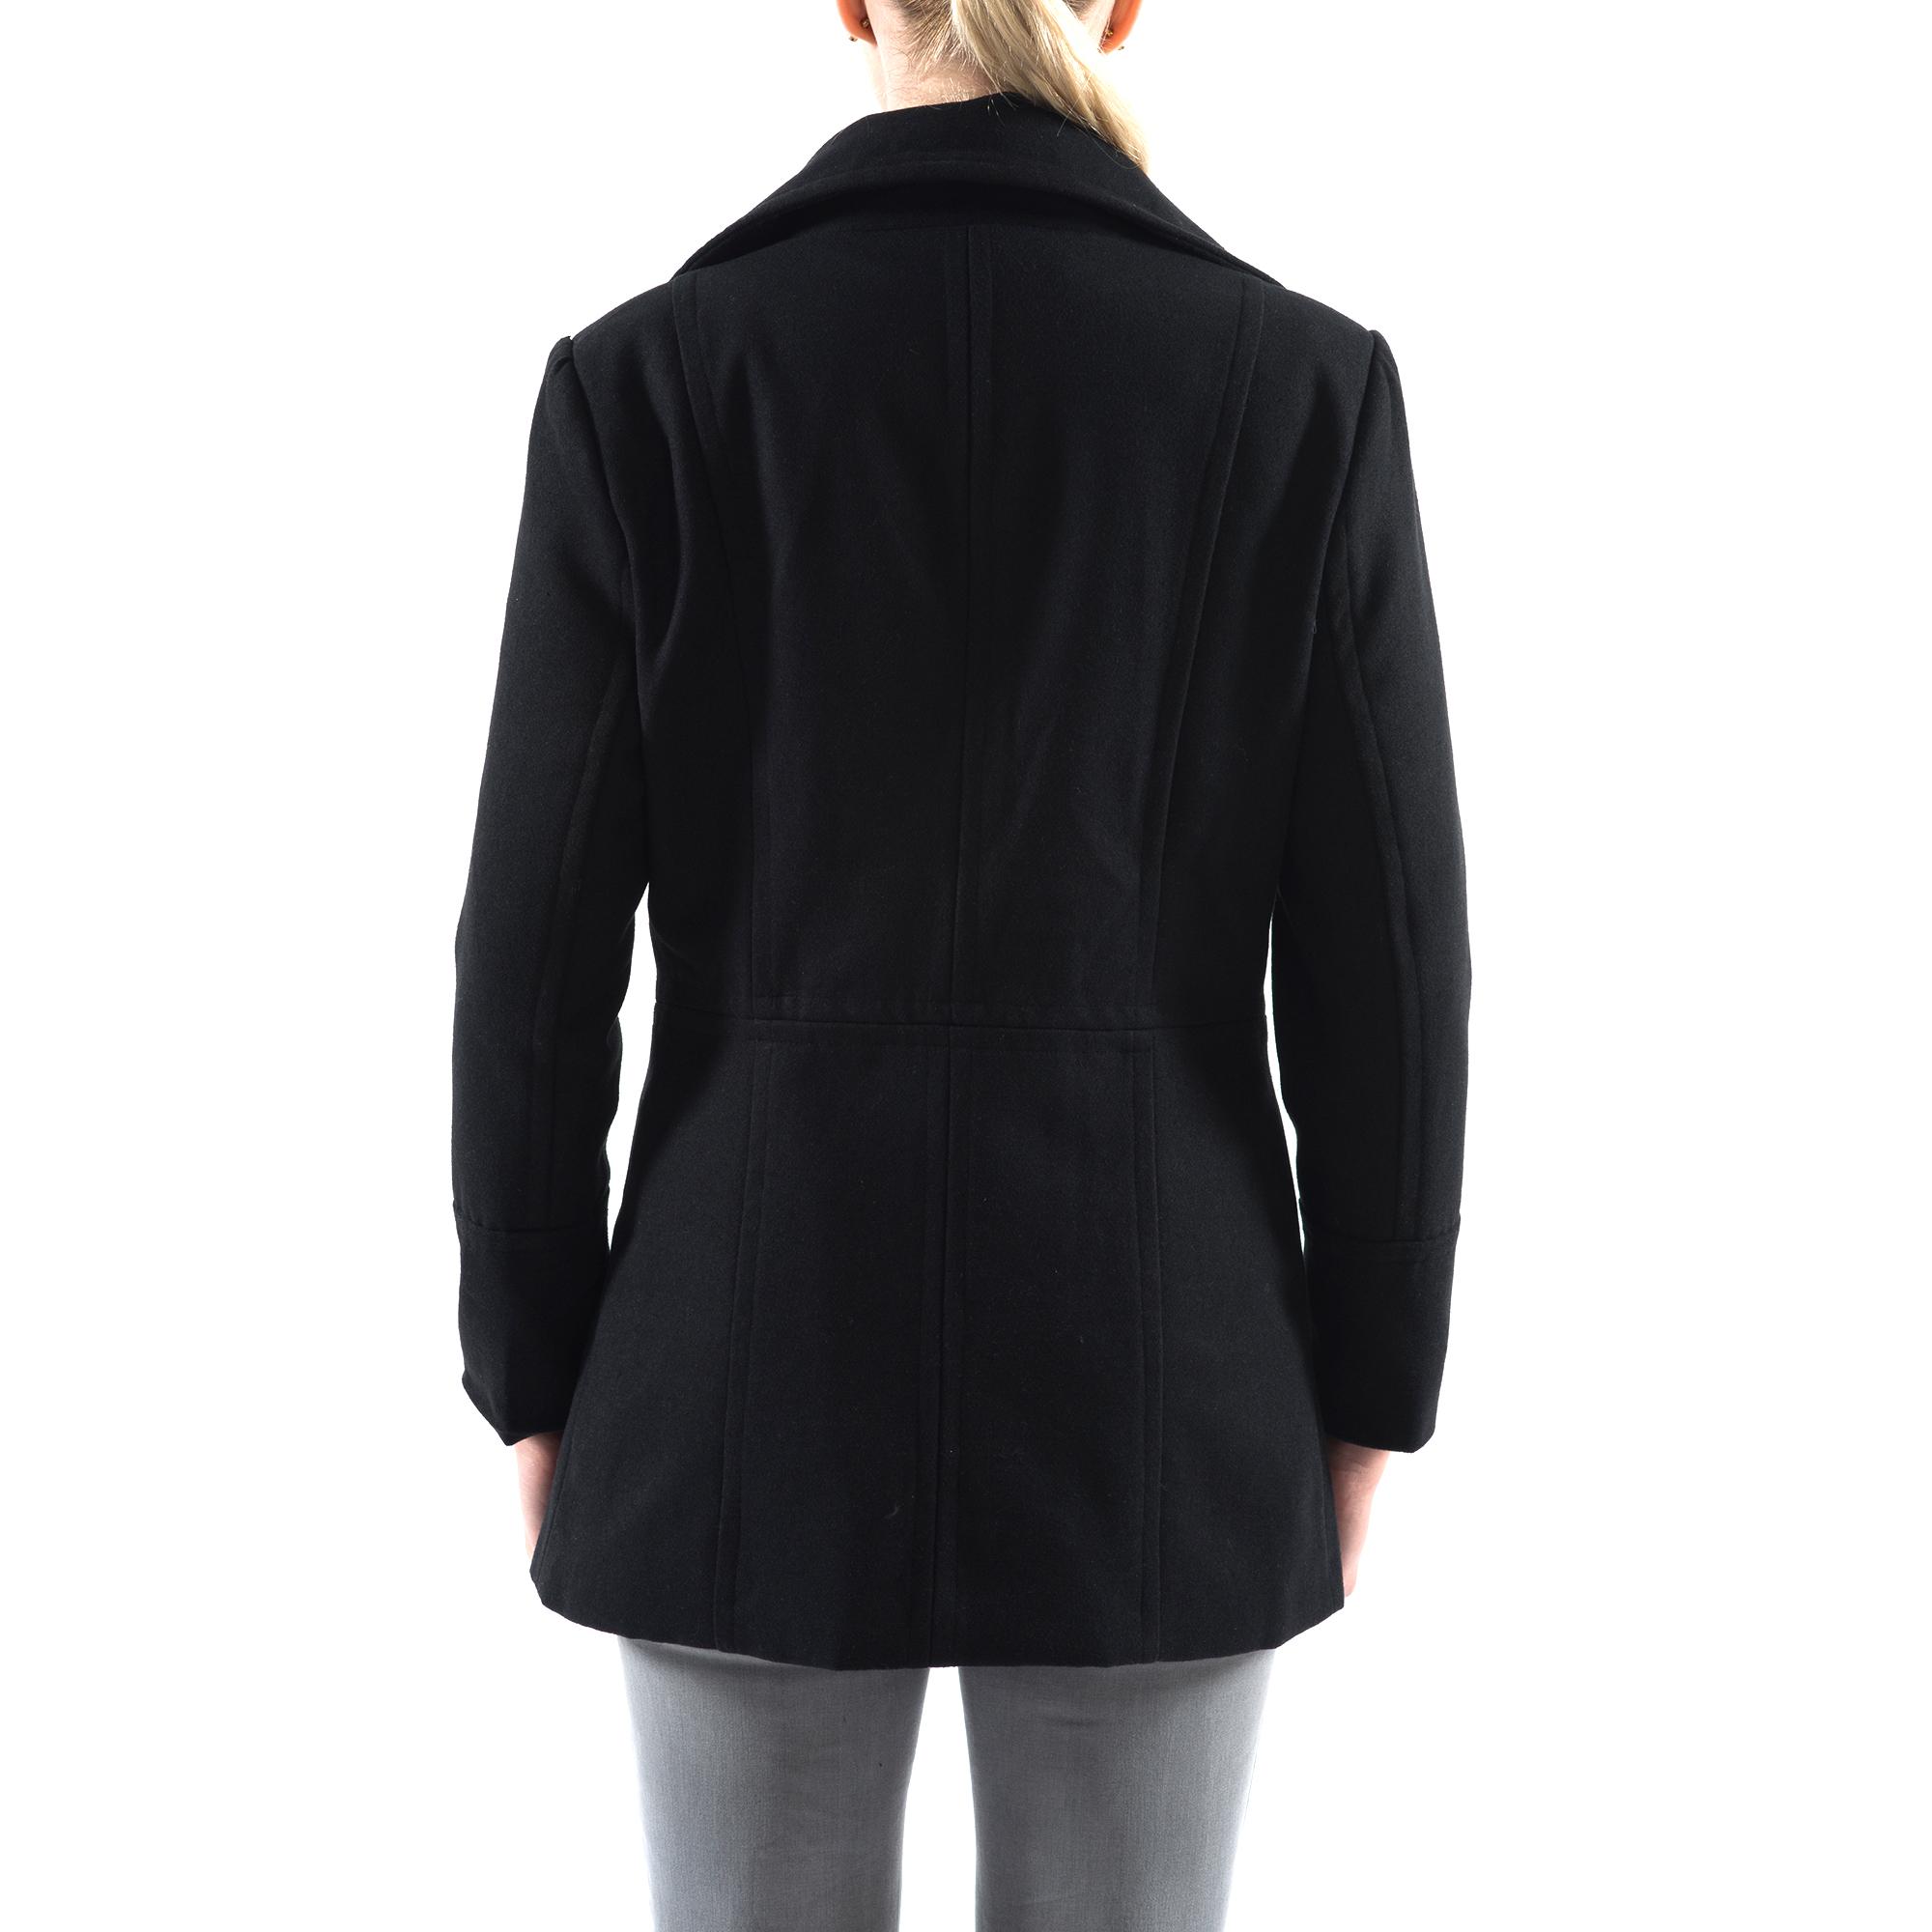 Alpine-Swiss-Emma-Womens-Peacoat-Jacket-Wool-Blazer-Double-Breasted-Overcoat-New thumbnail 19